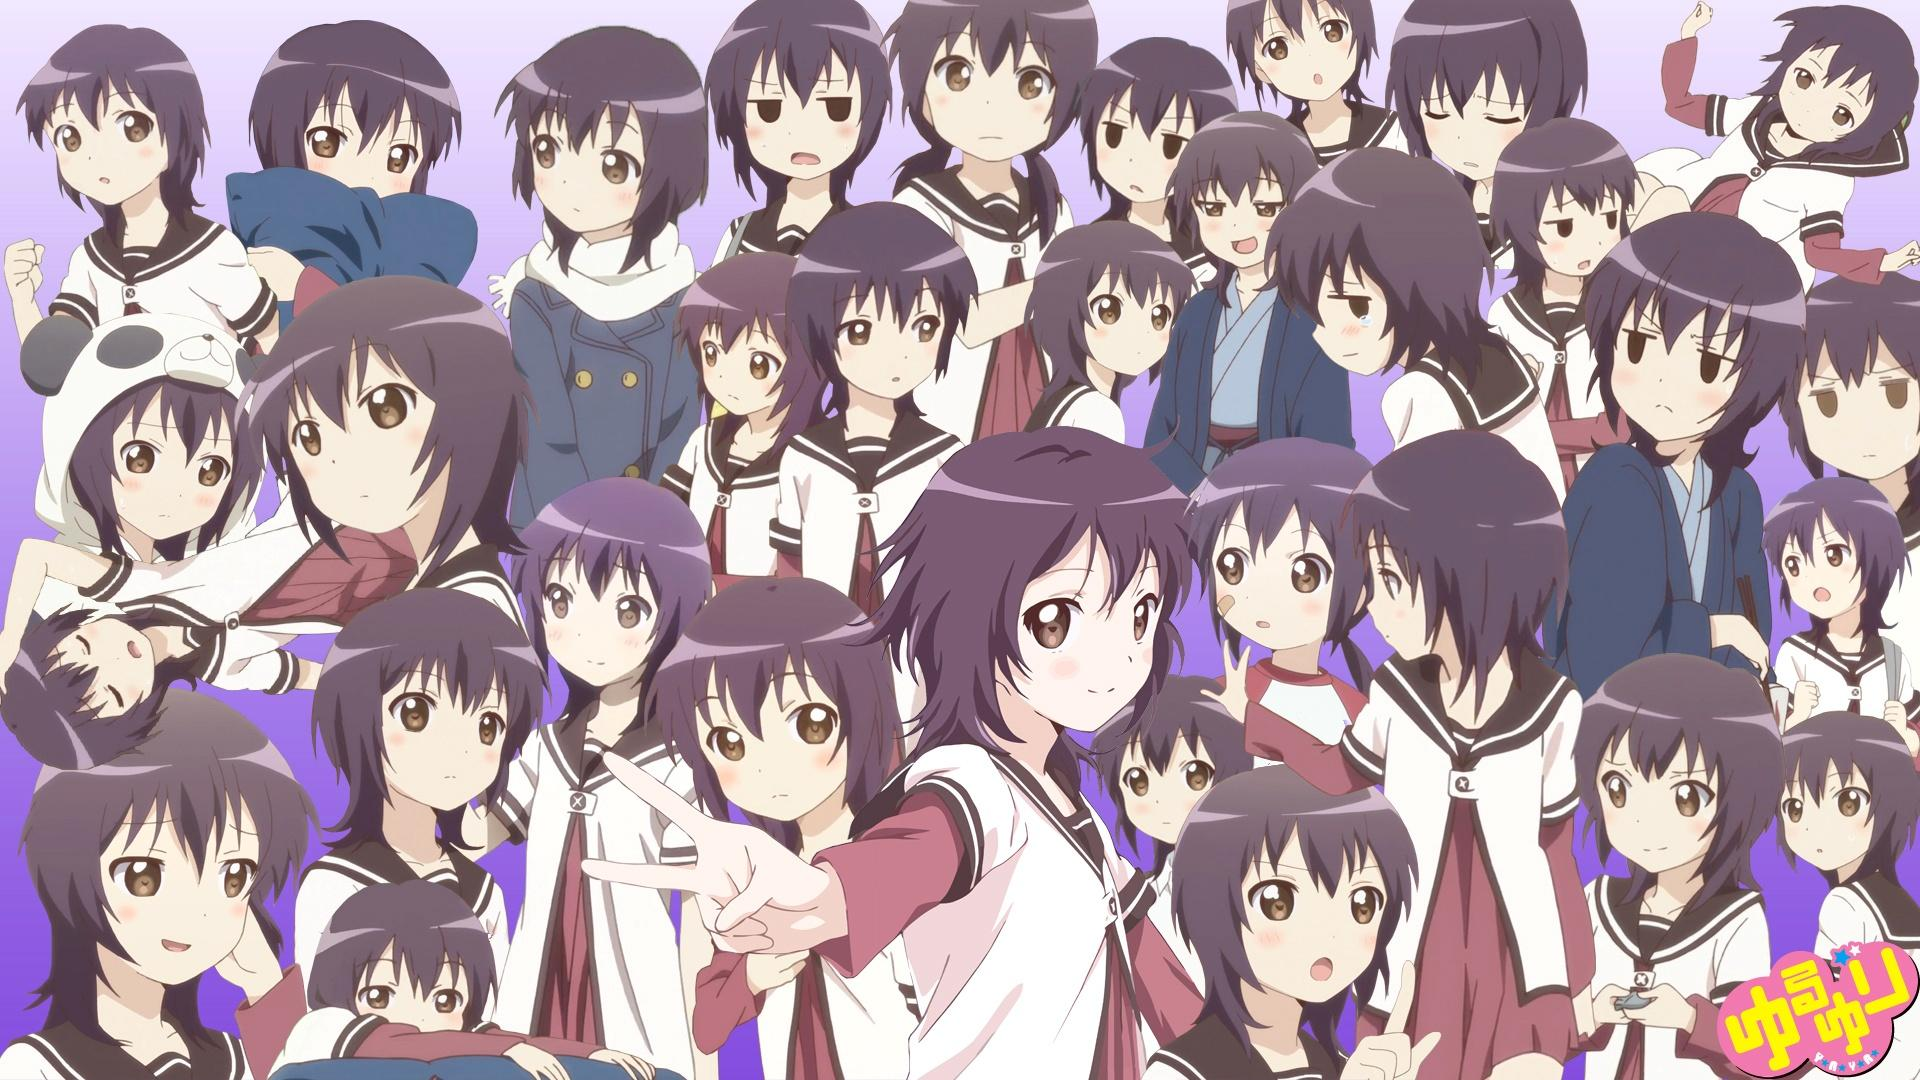 Anime Characters Named Yuri : ゆるゆり 壁紙 画像 【 枚】 次元画像壁紙収集所